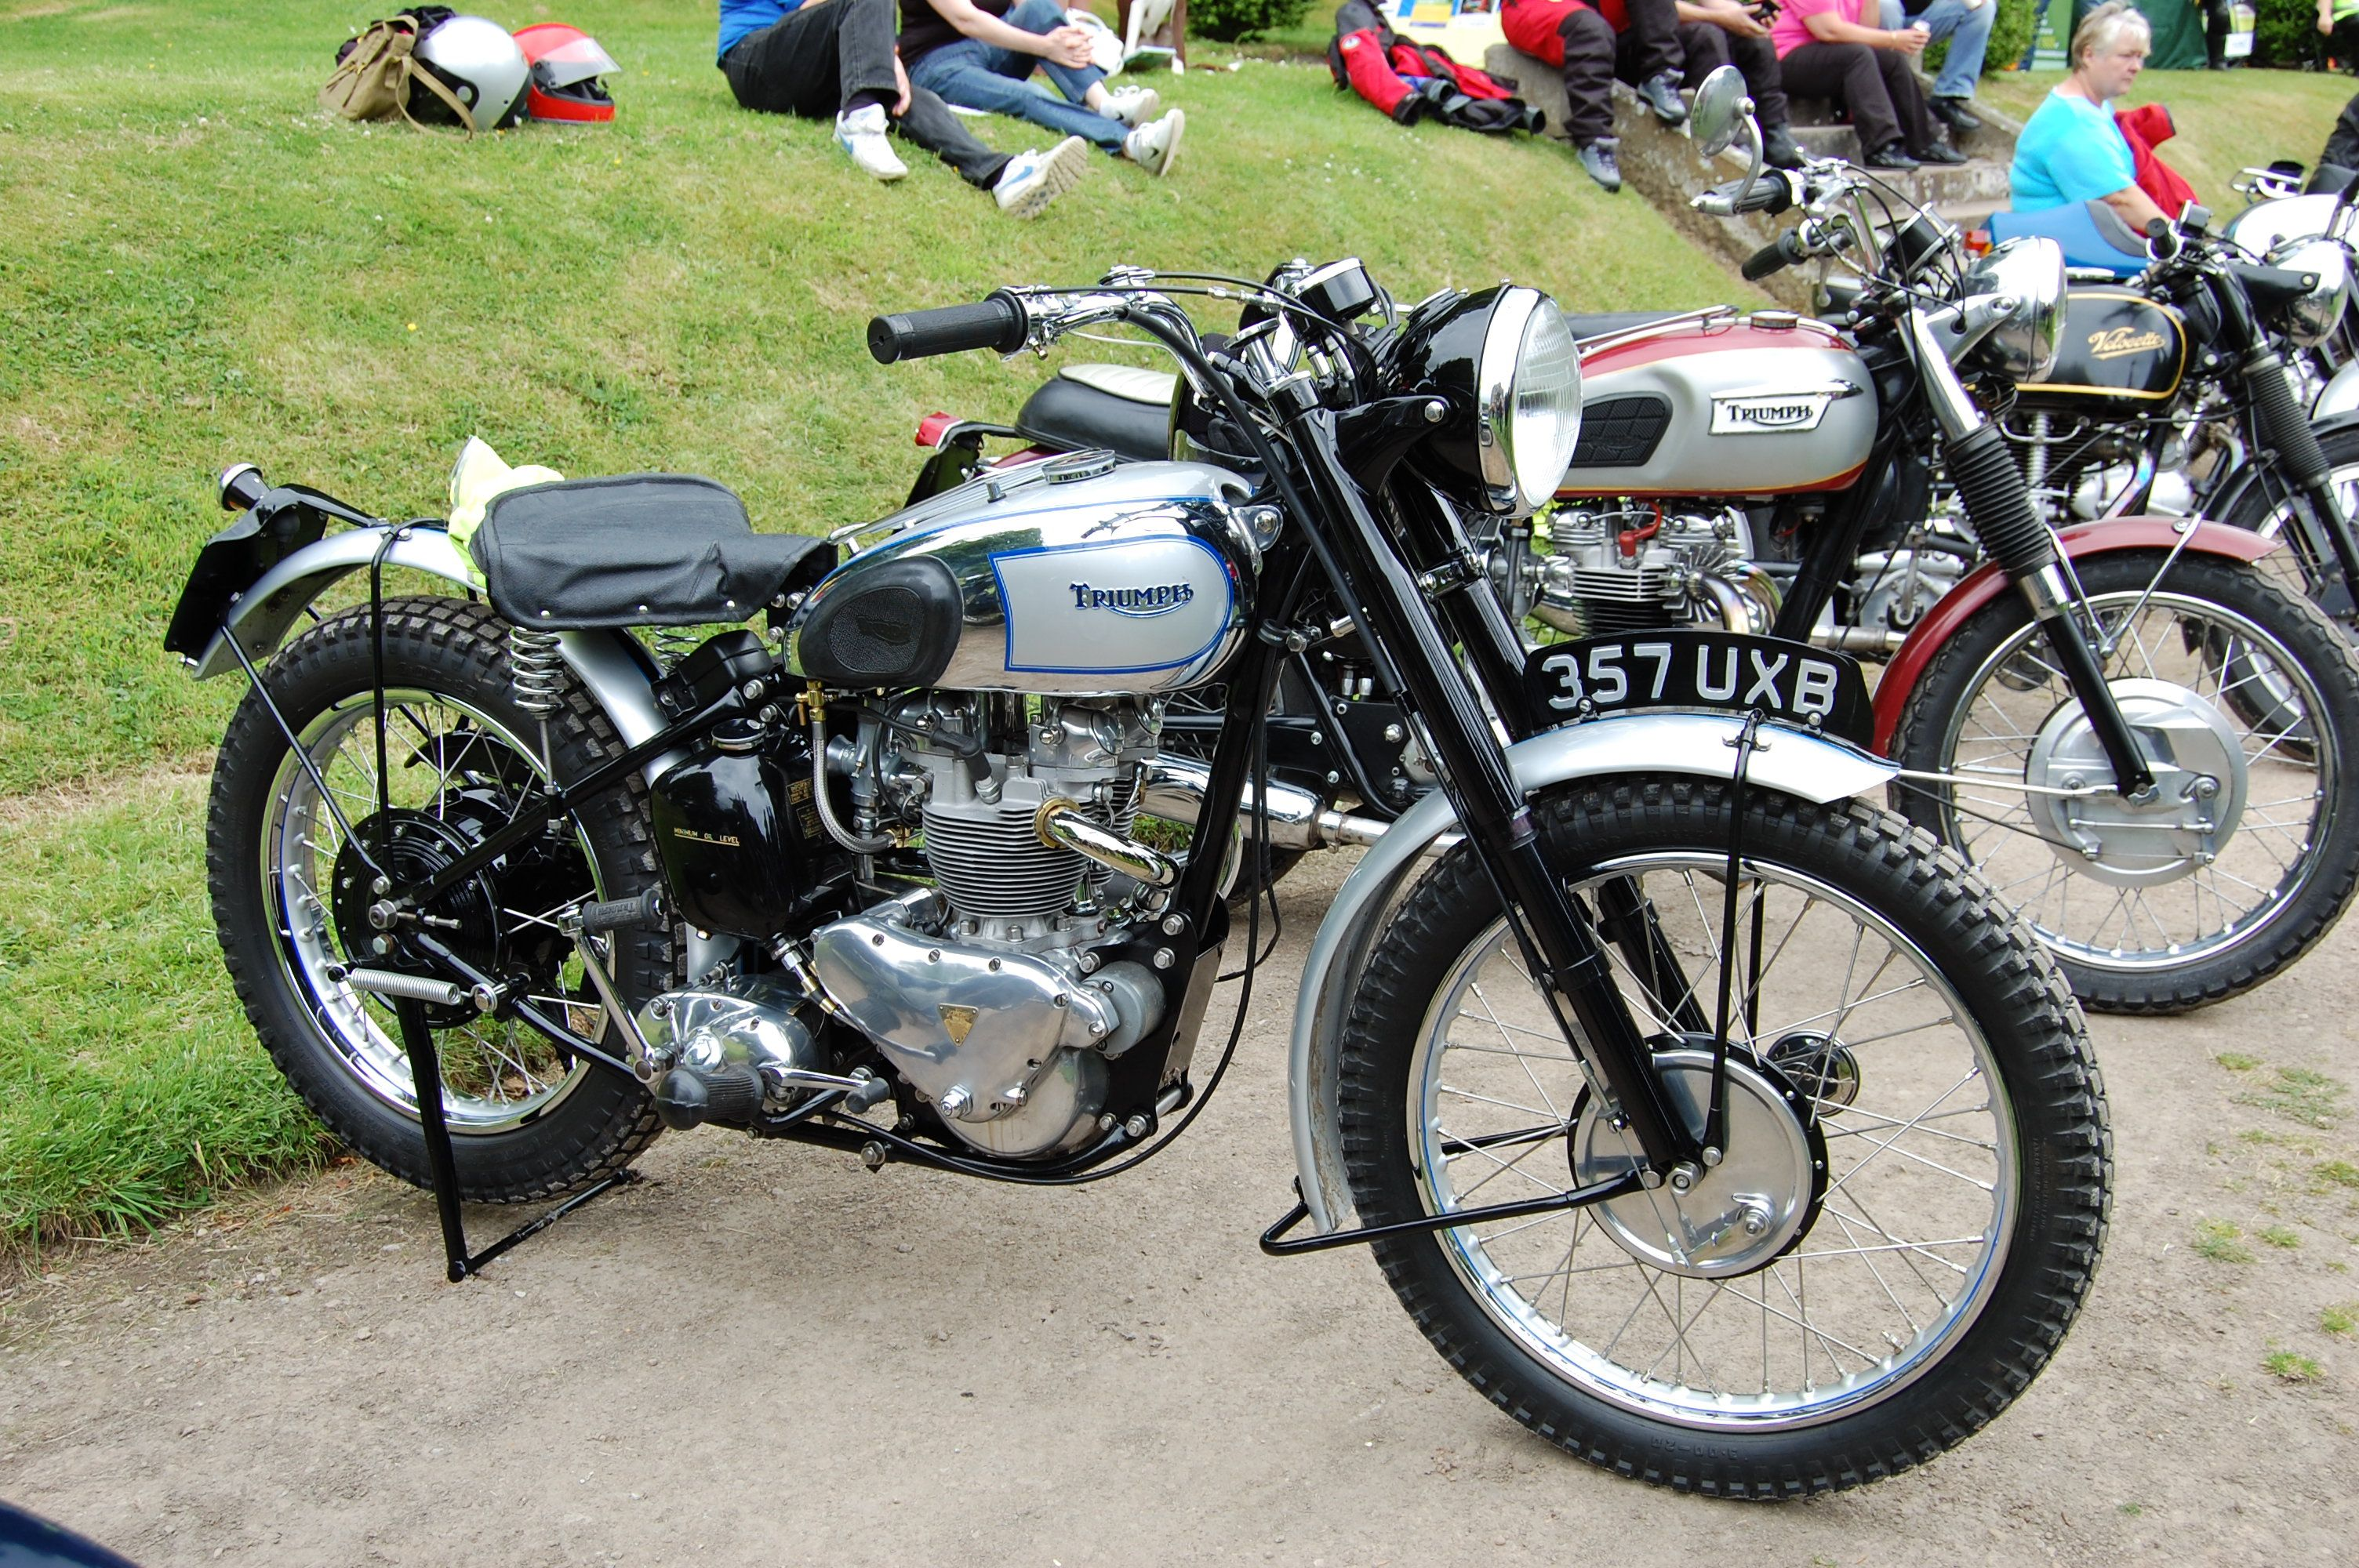 triumph 500 | file:triumph trophy tr5 rear in hub suspension 500cc